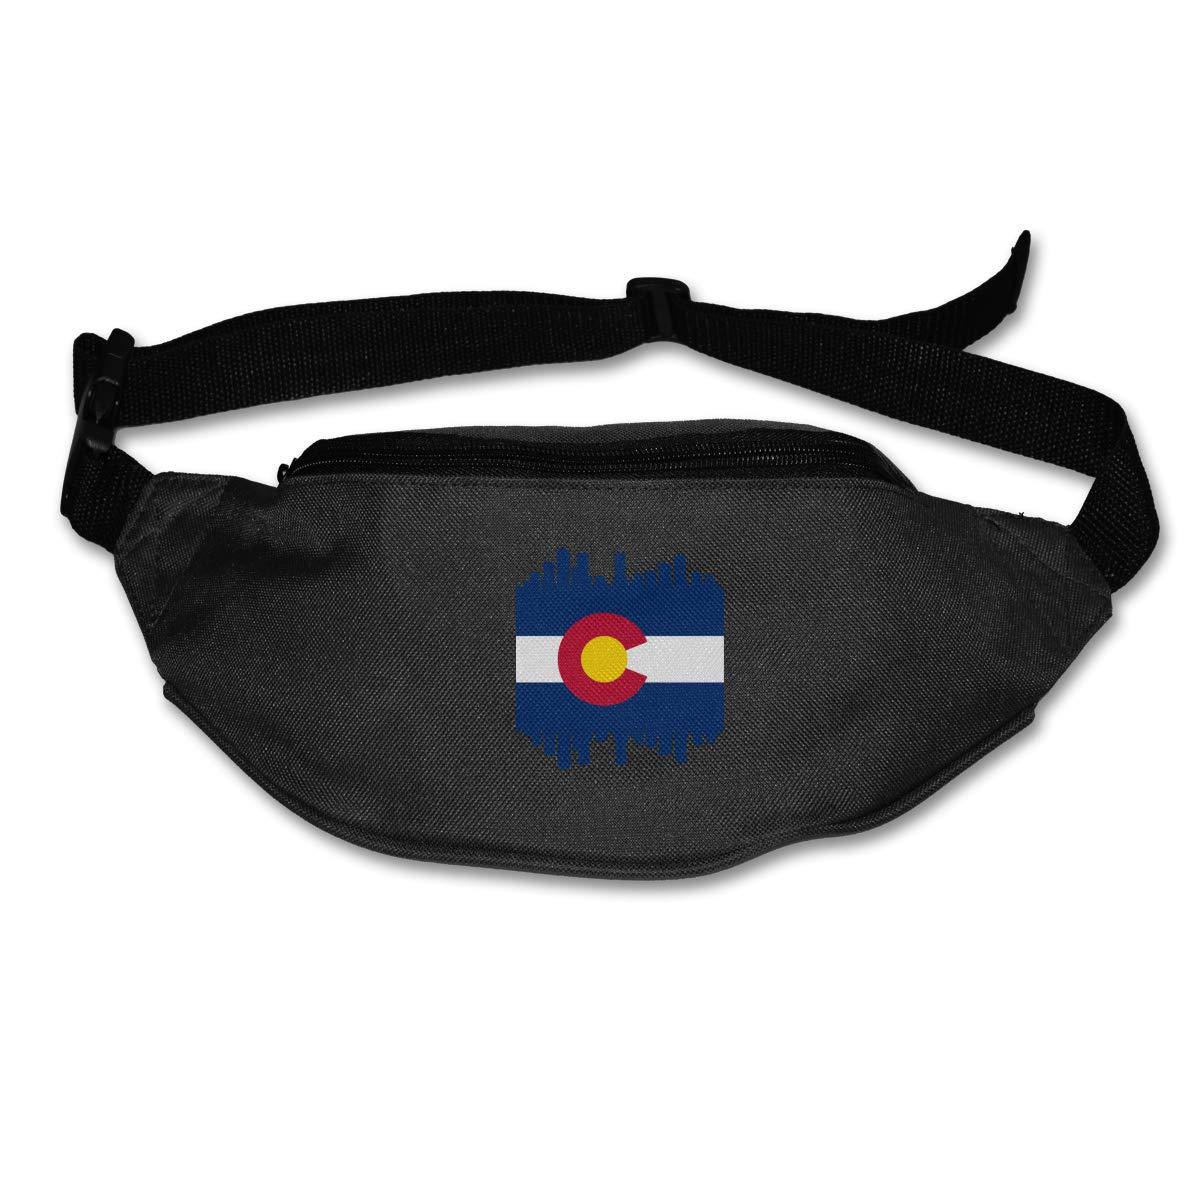 Colorado State Flag City Sport Waist Bag Fanny Pack Adjustable For Hike